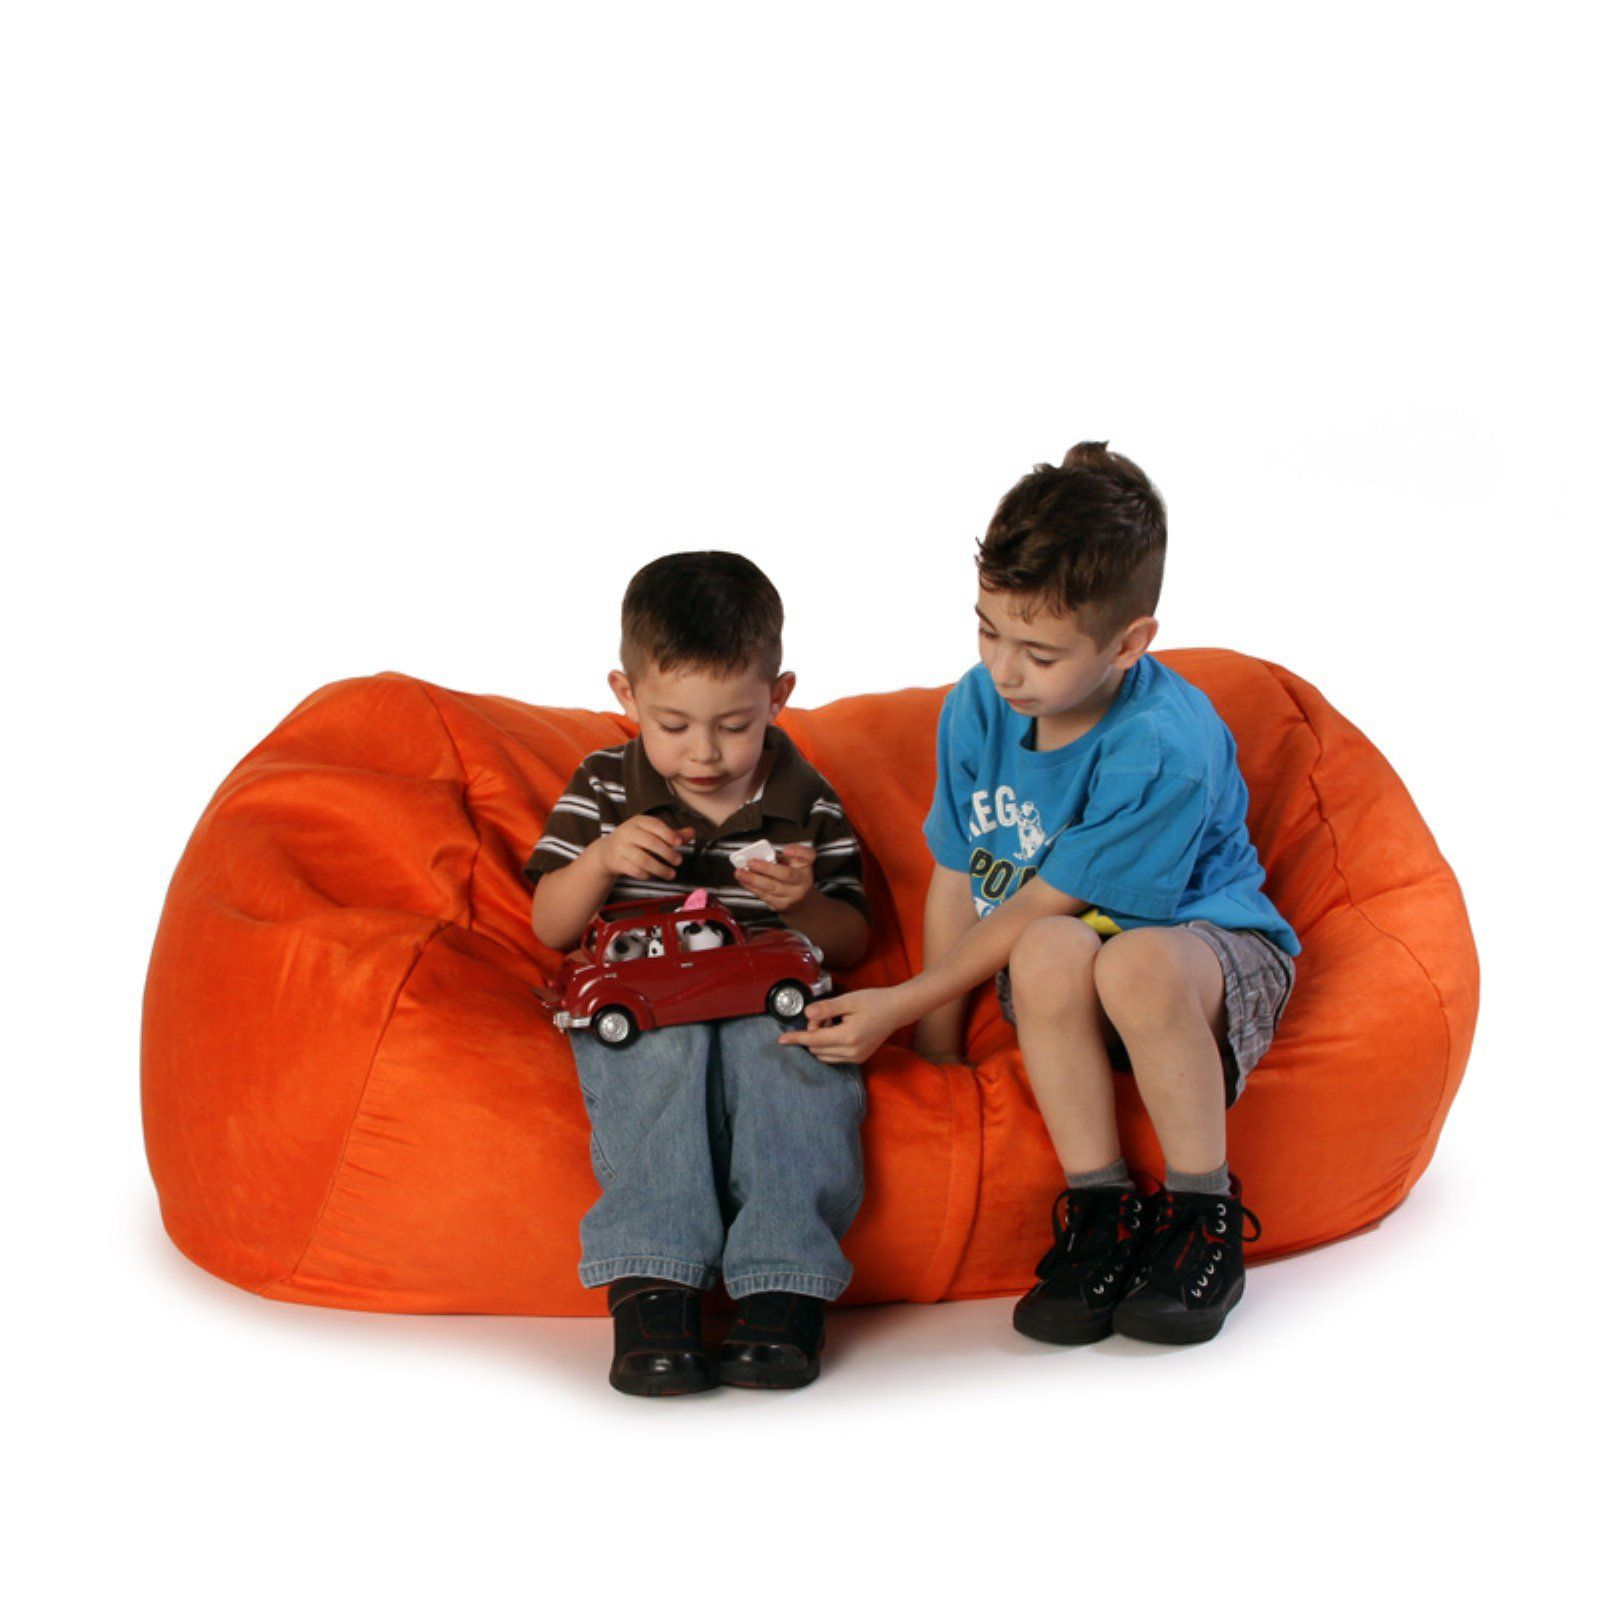 Phenomenal Jaxx Lounger Jr Bean Bag Orange Products In 2019 Bean Unemploymentrelief Wooden Chair Designs For Living Room Unemploymentrelieforg